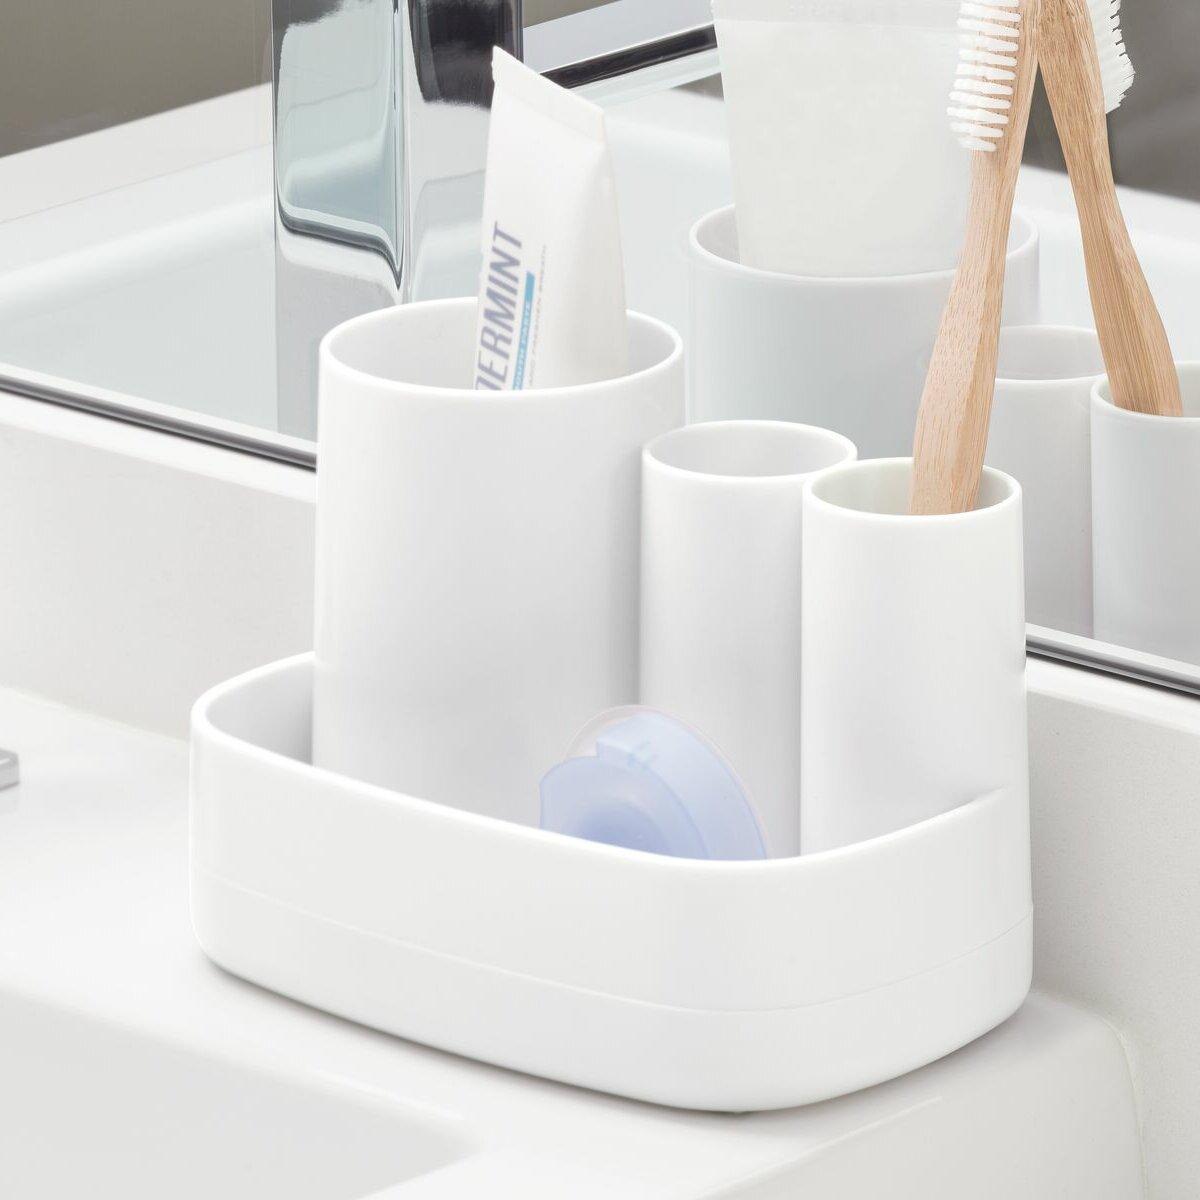 Idesign Cade Toothbrush Holder